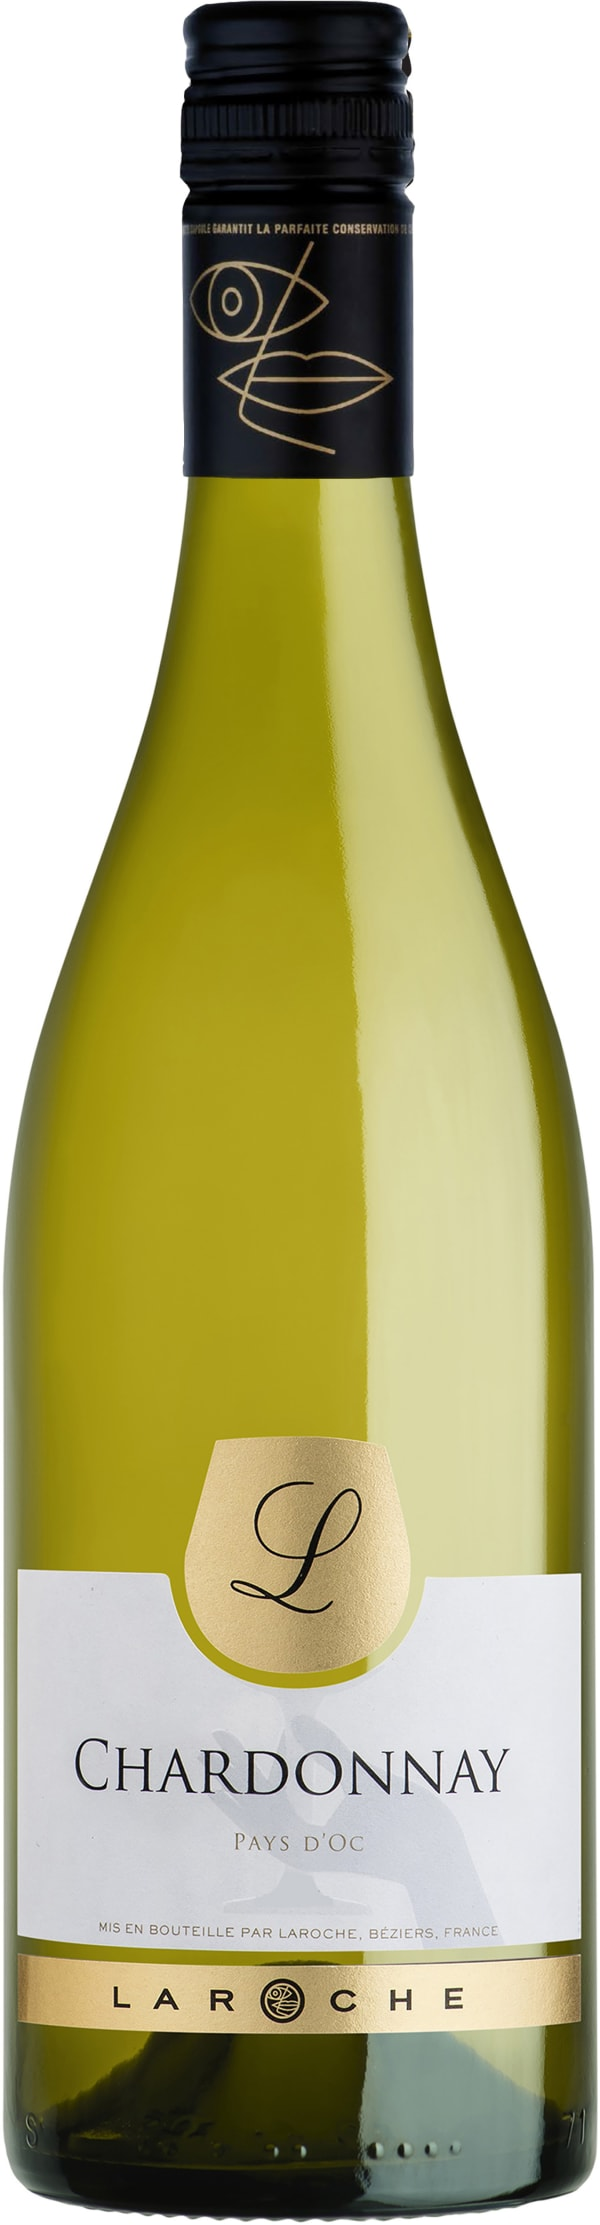 Laroche Chardonnay L 2019